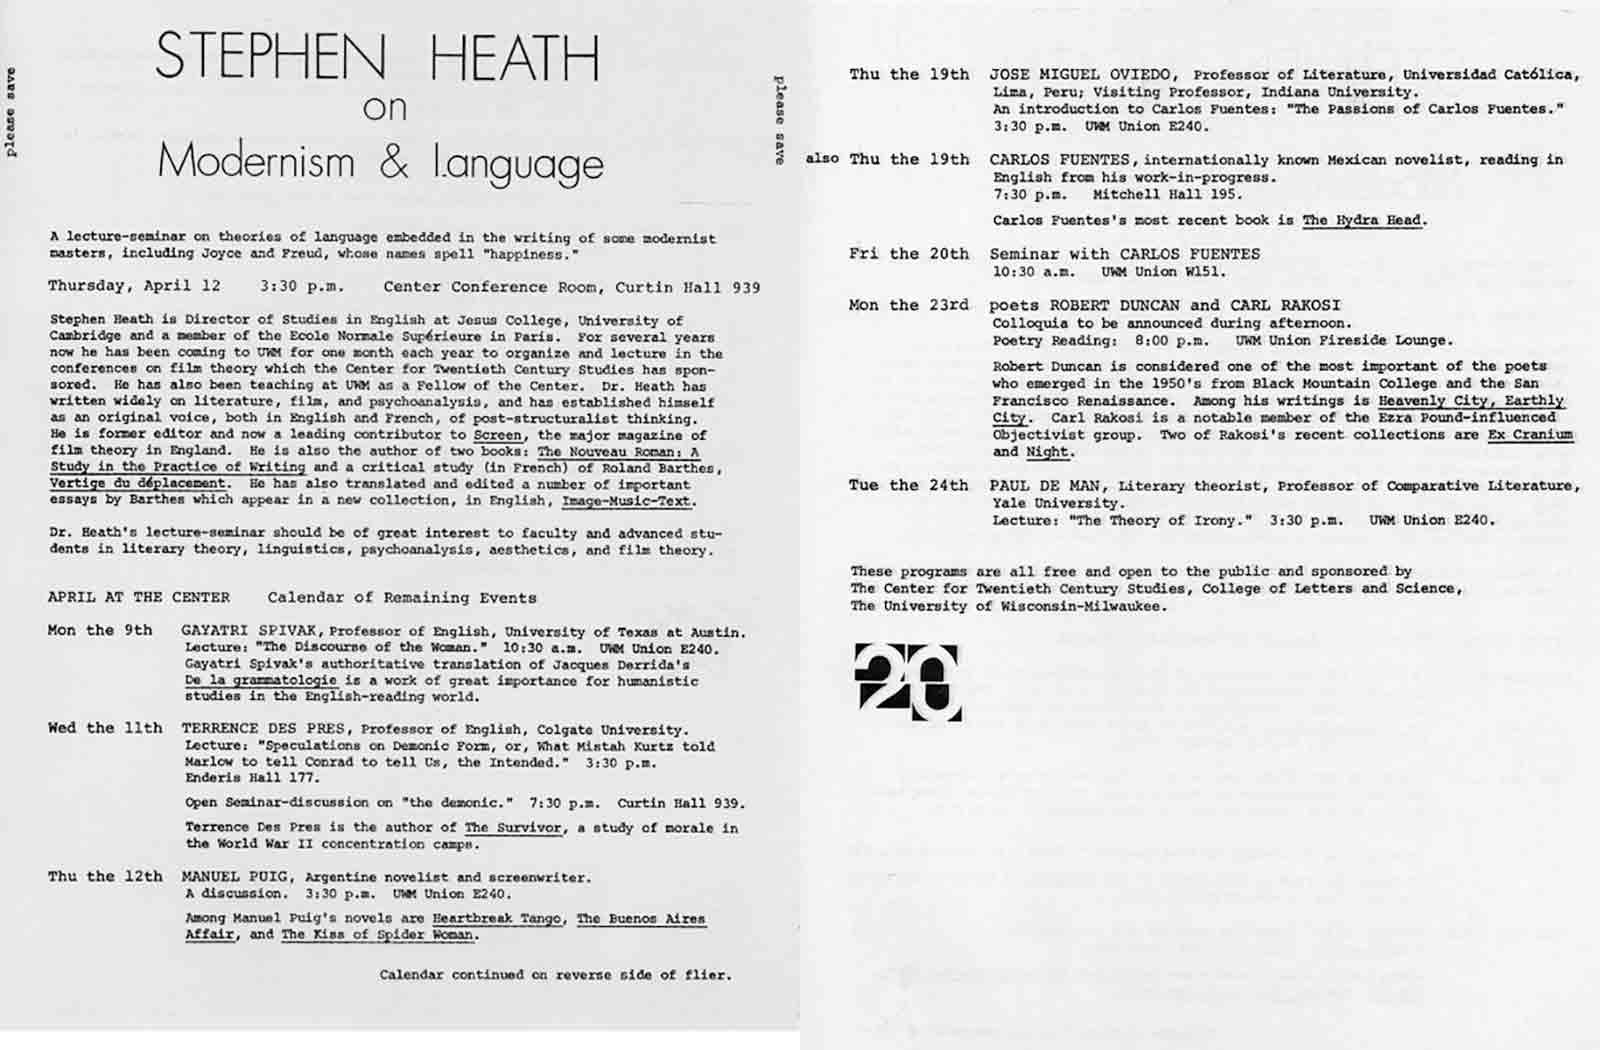 Stephen Heath